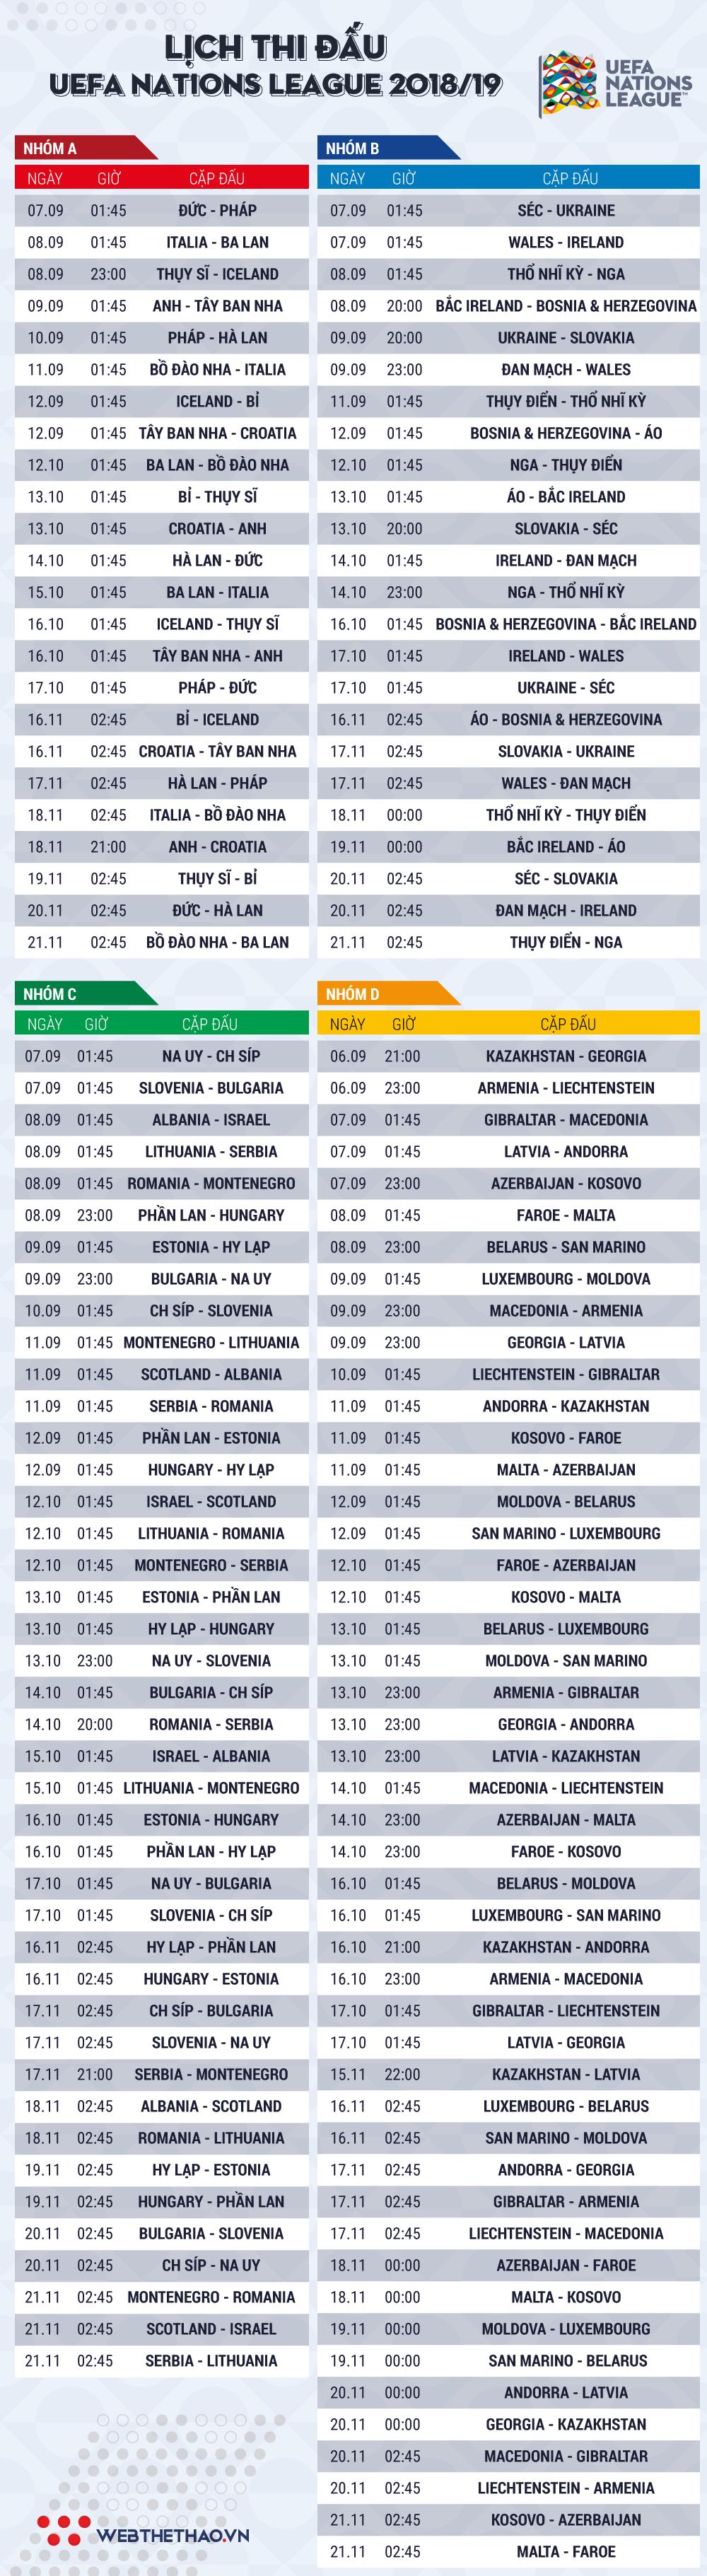 Lịch thi đấu UEFA Nations League 2018/19 - Ảnh 5.